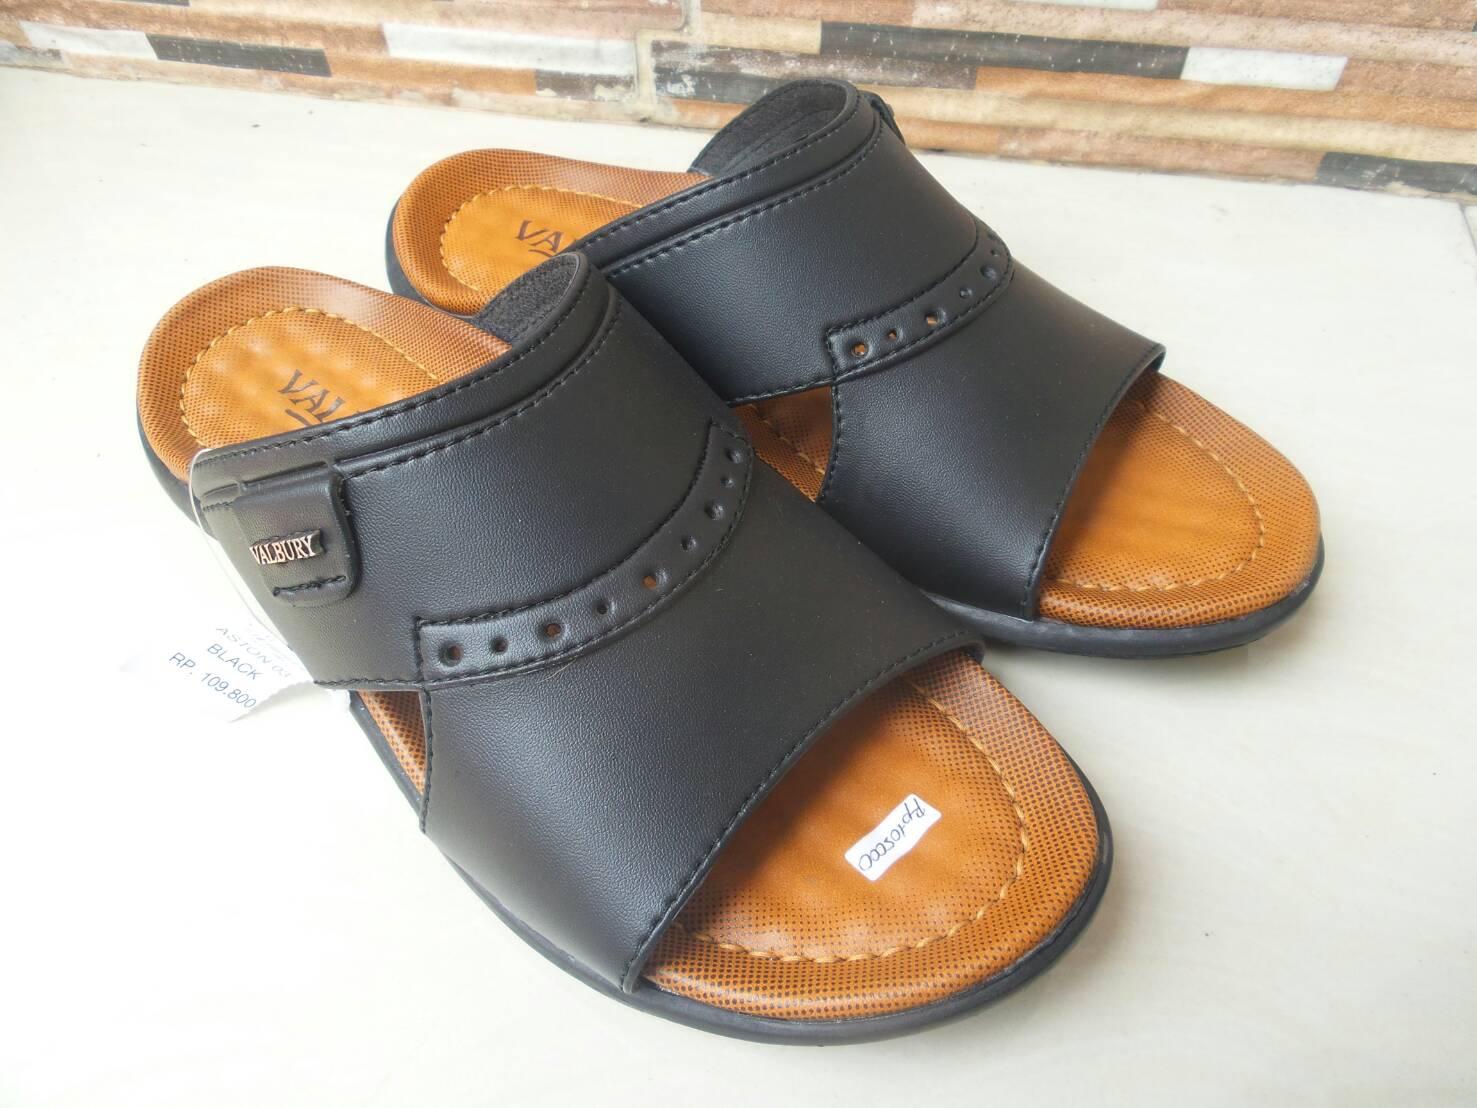 Jual Valbury Sandals Original - Slop - BlackBrown ...